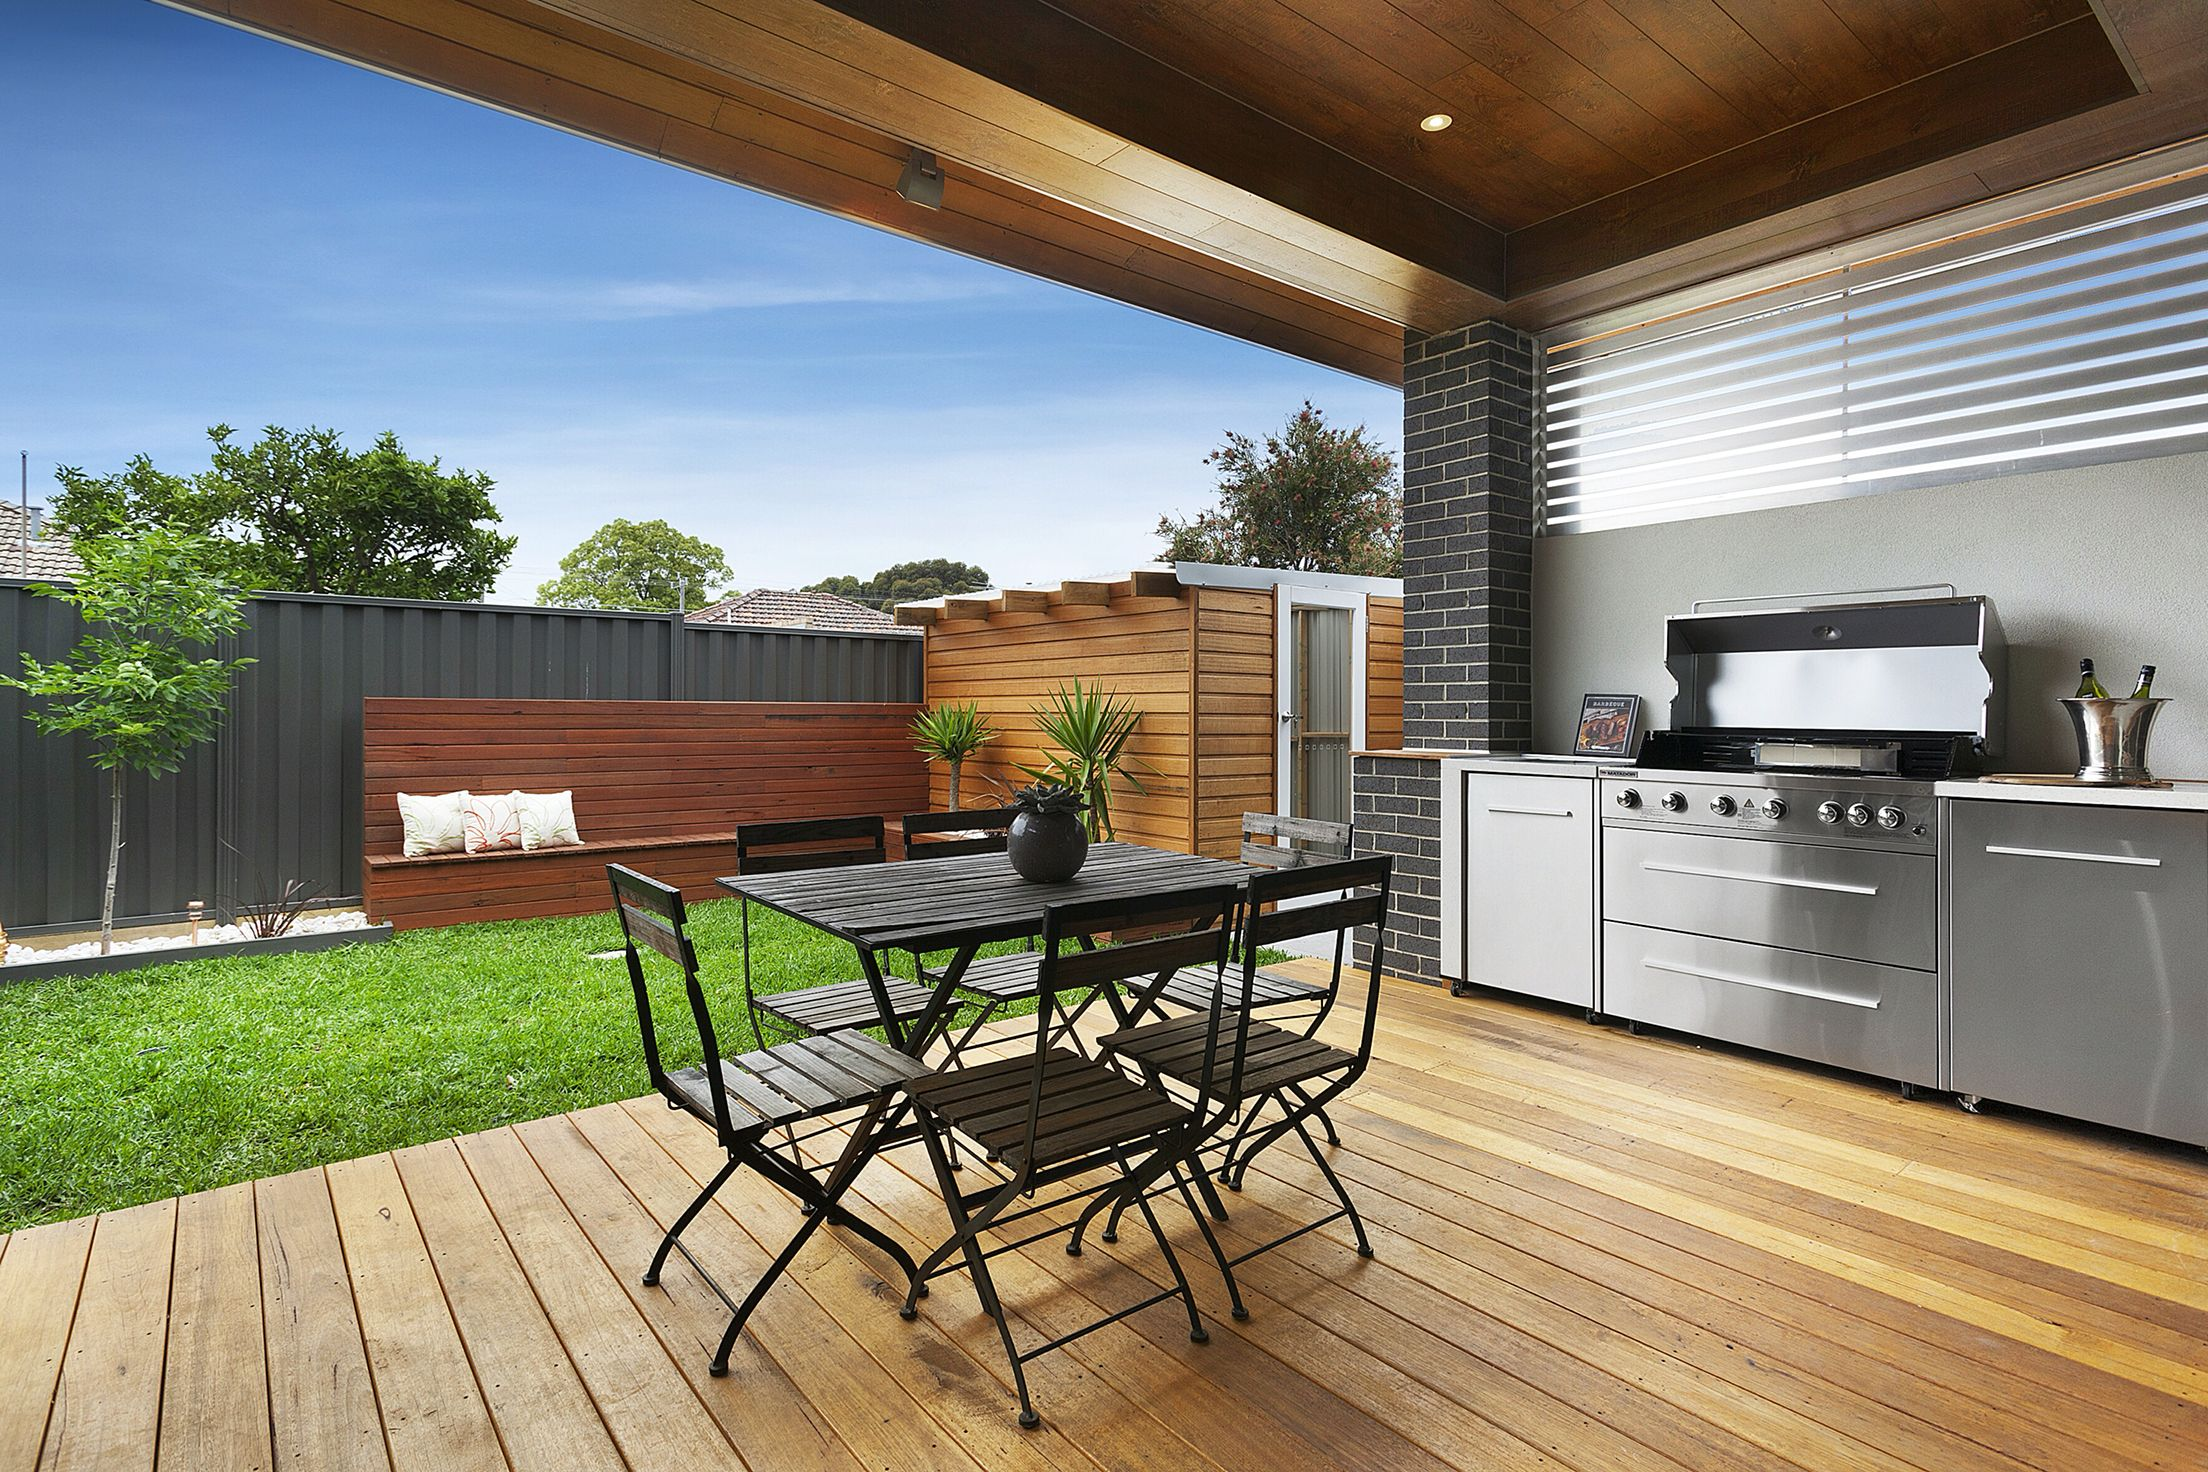 Modern Alfresco Backyard Decking Bbq Built In Small Courtyard